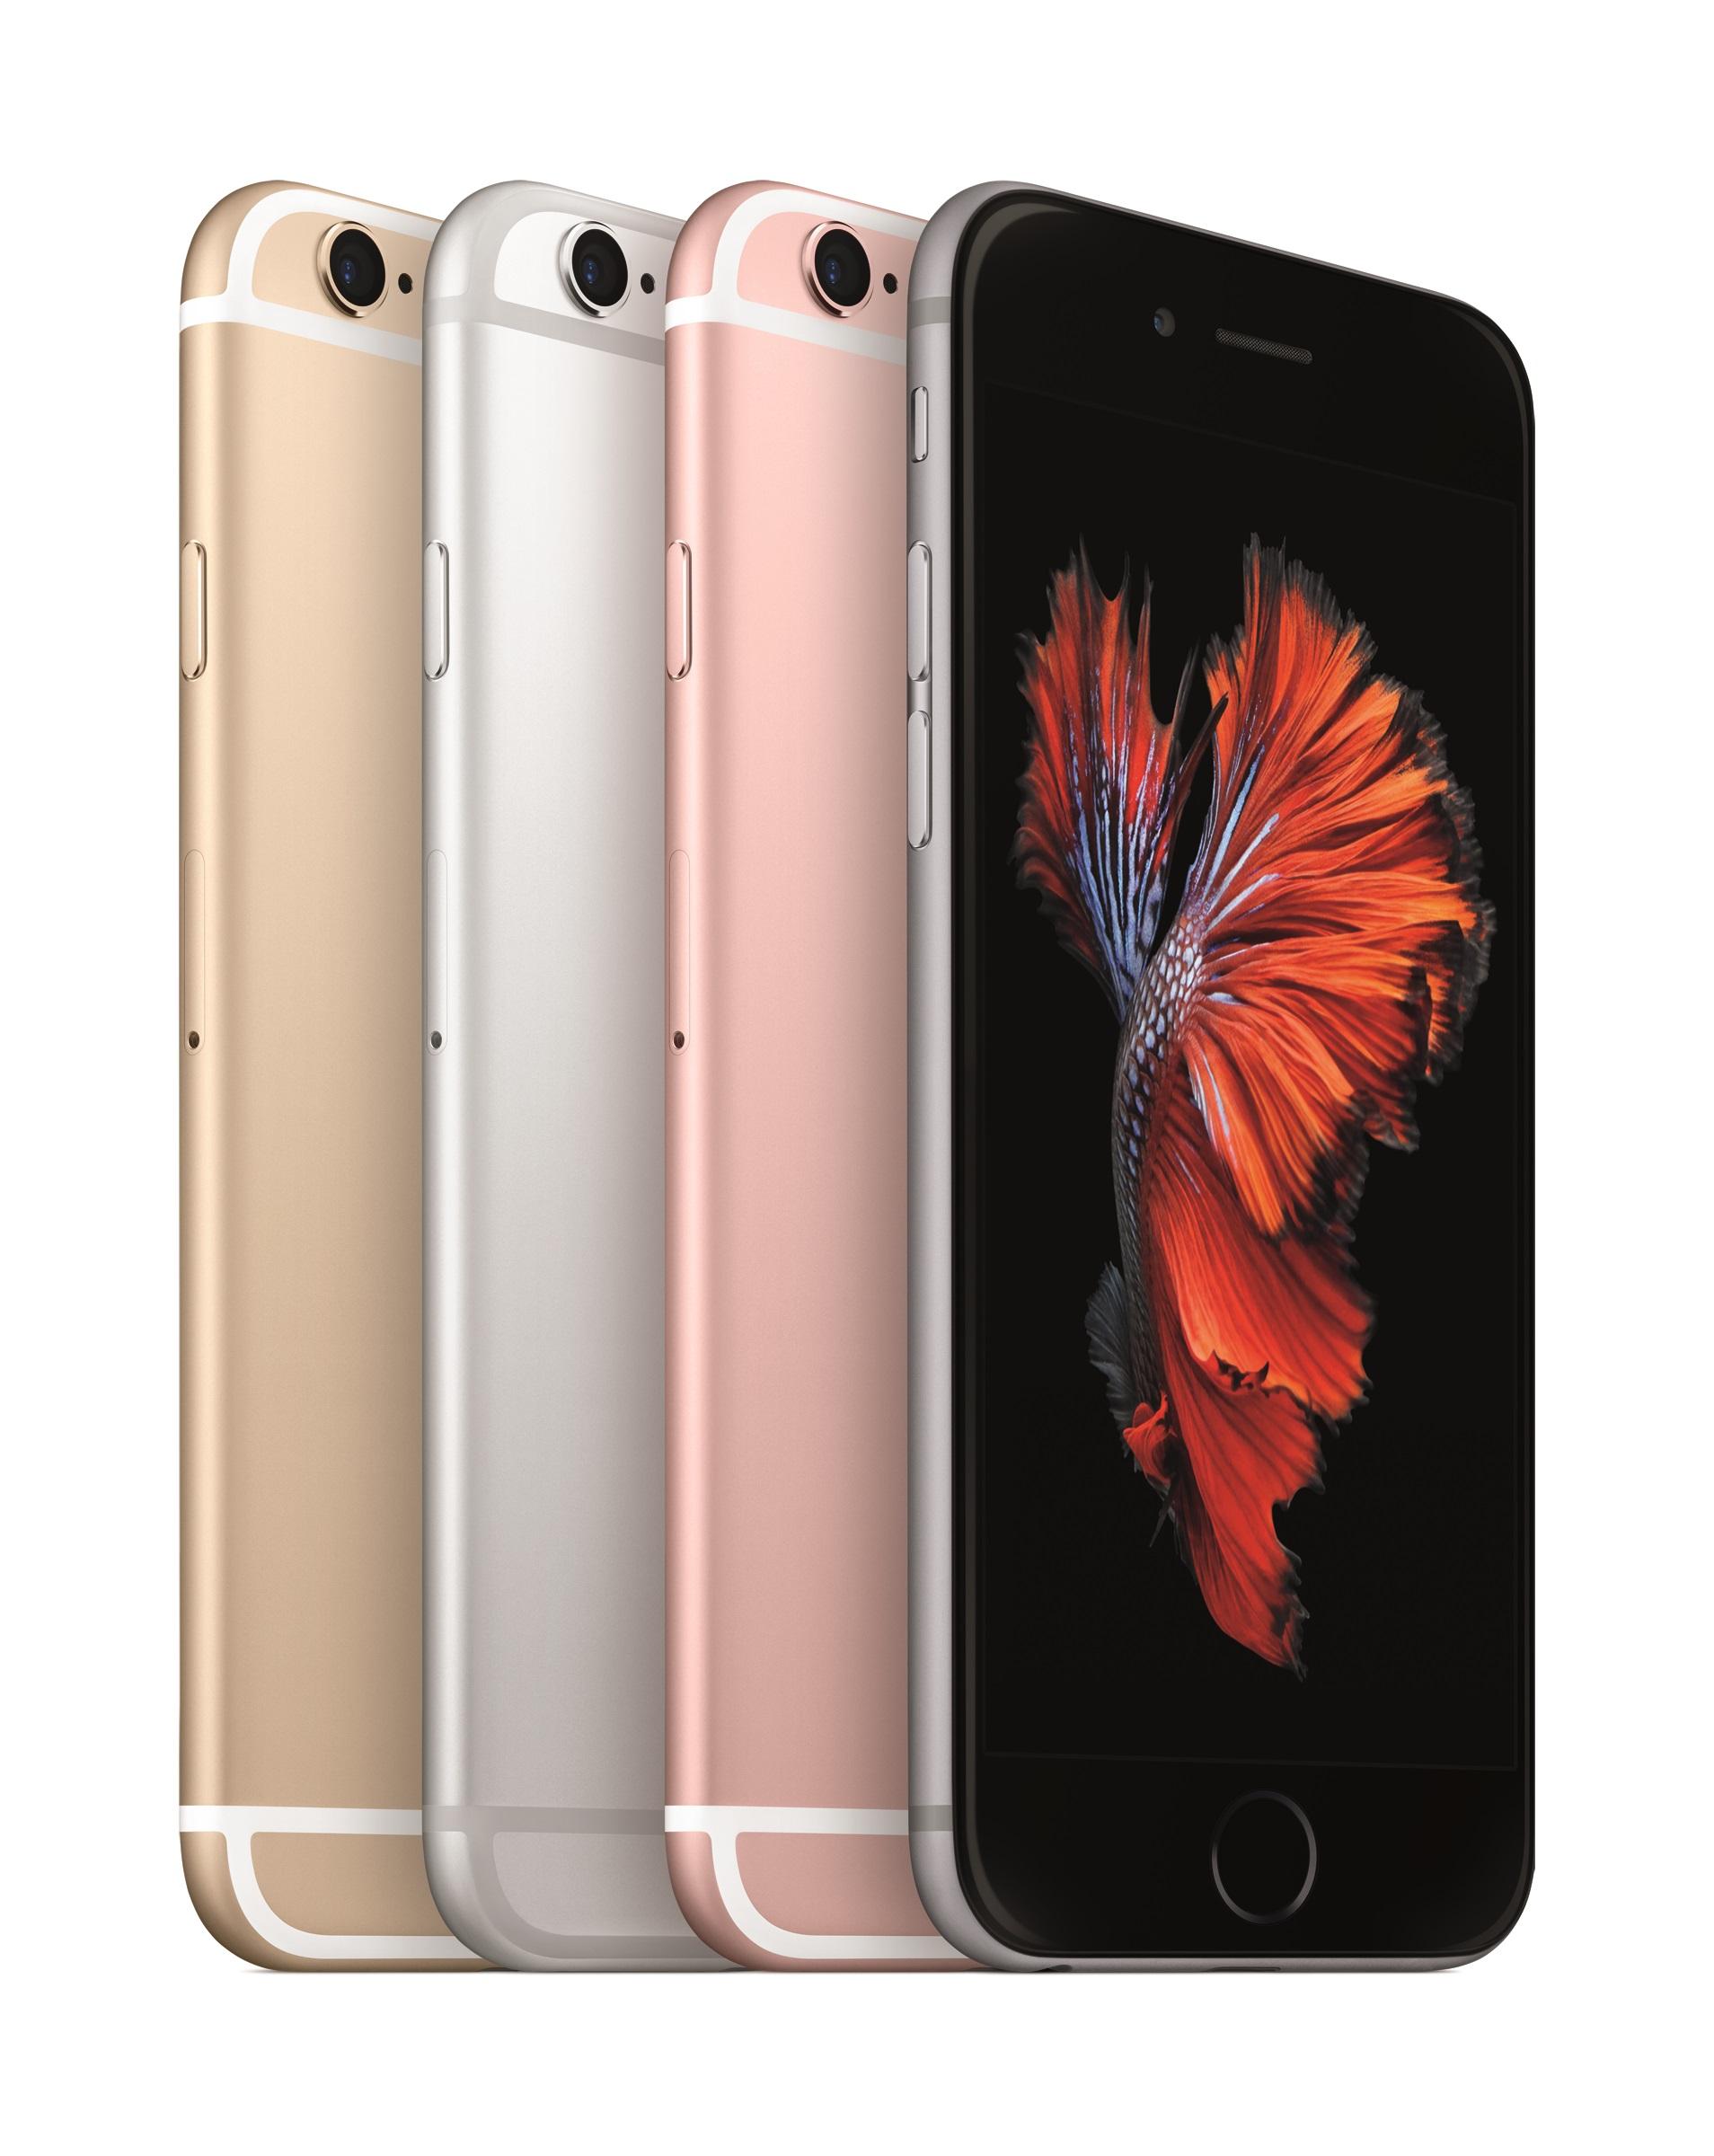 Spada sprzedaż iPhone'a